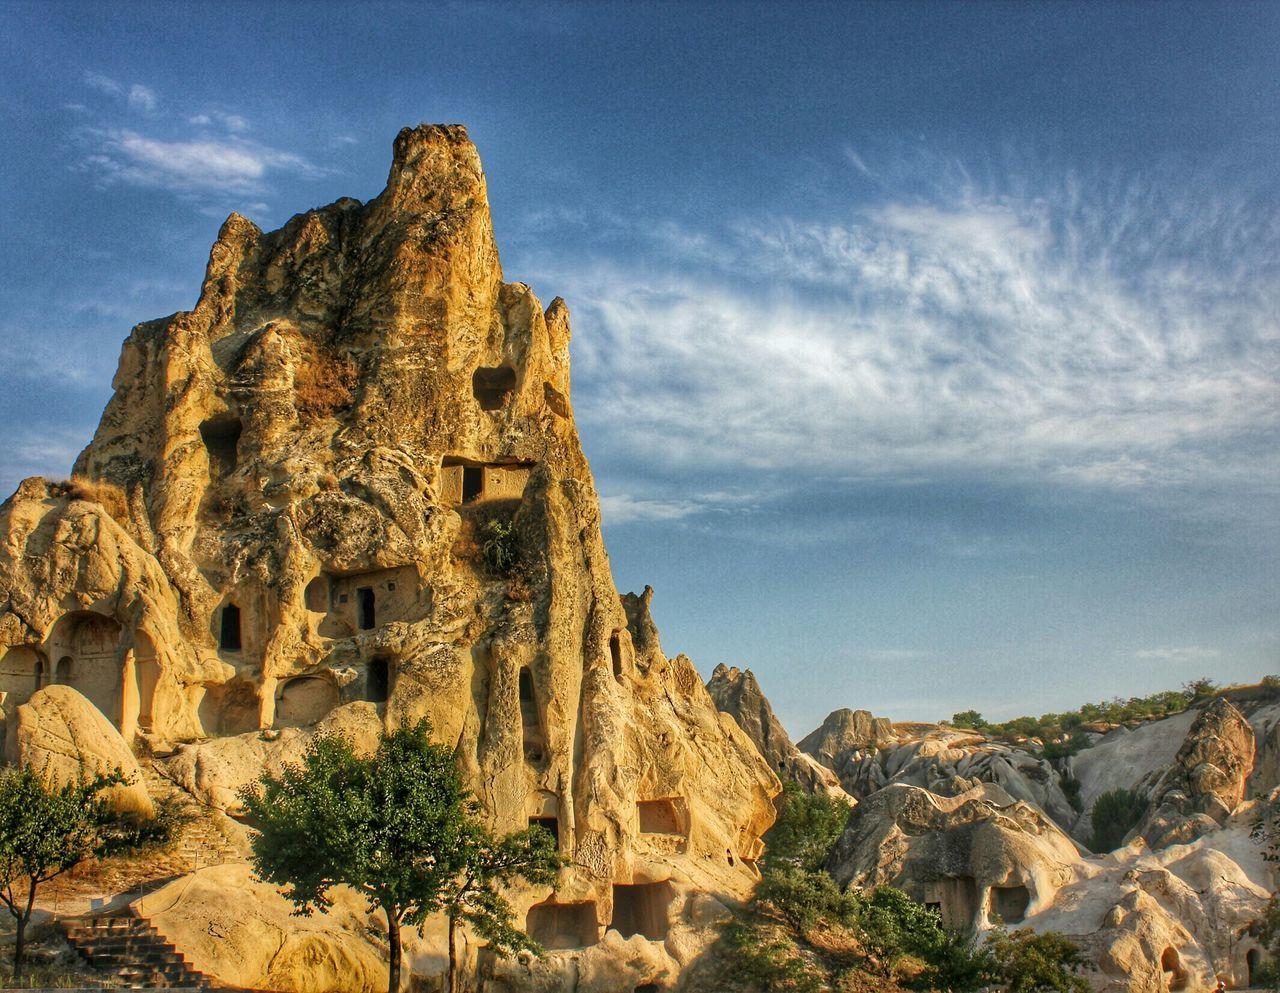 Capadoccia Cave House Turkey Nevşehir Göreme Sunset Sunset_collection Old Rock House